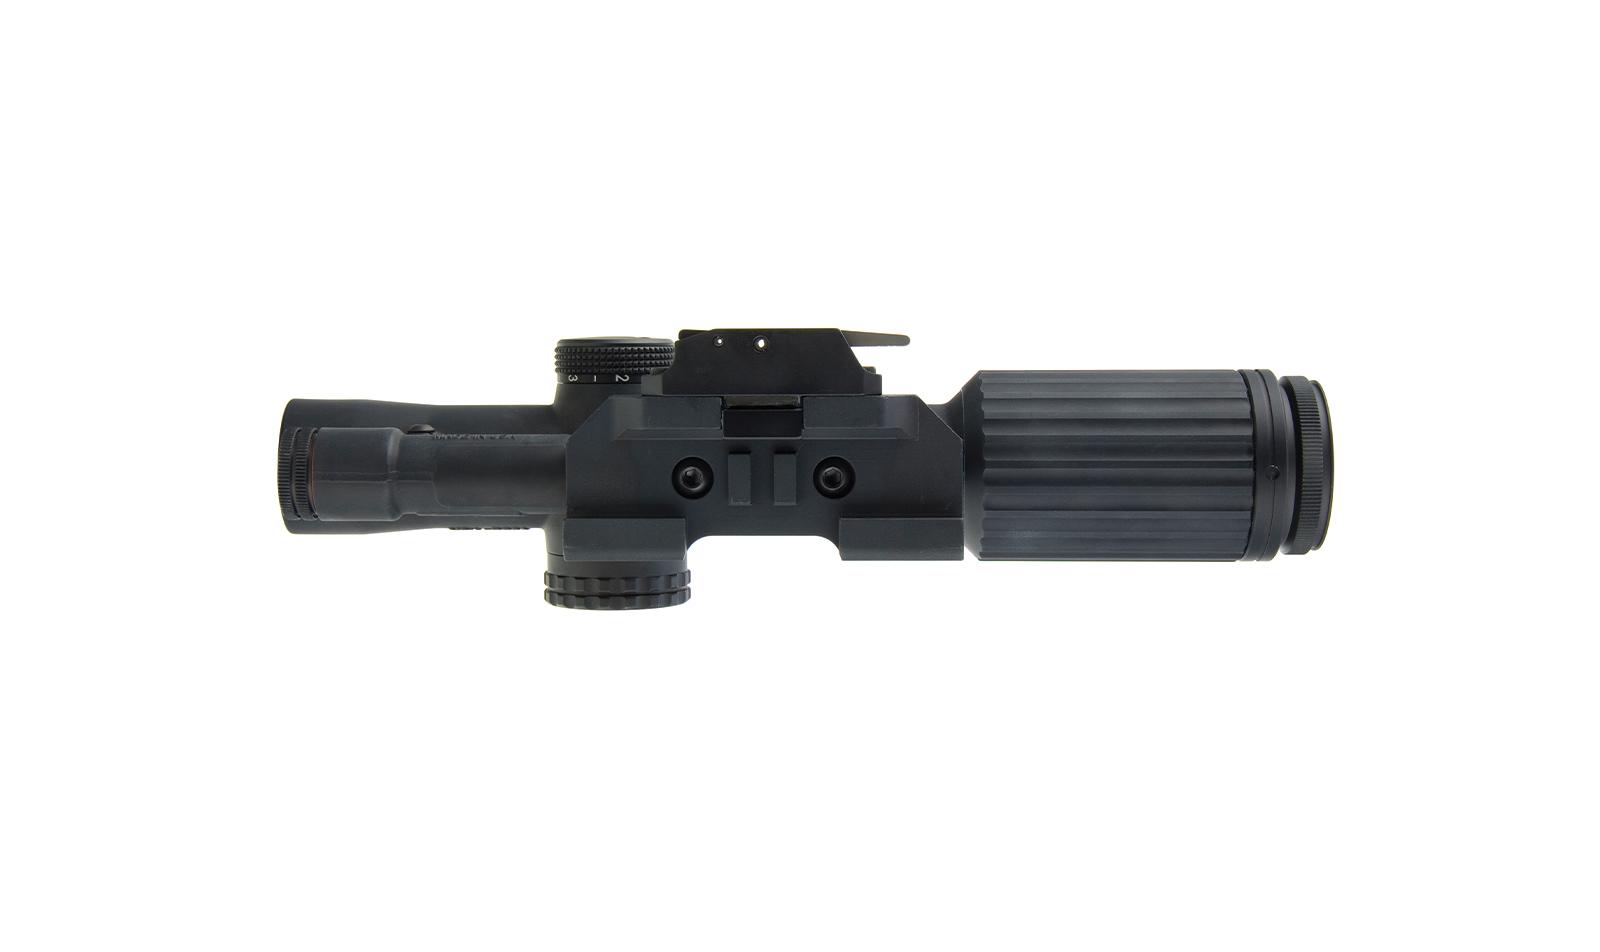 VC16-C-1600048 angle 10